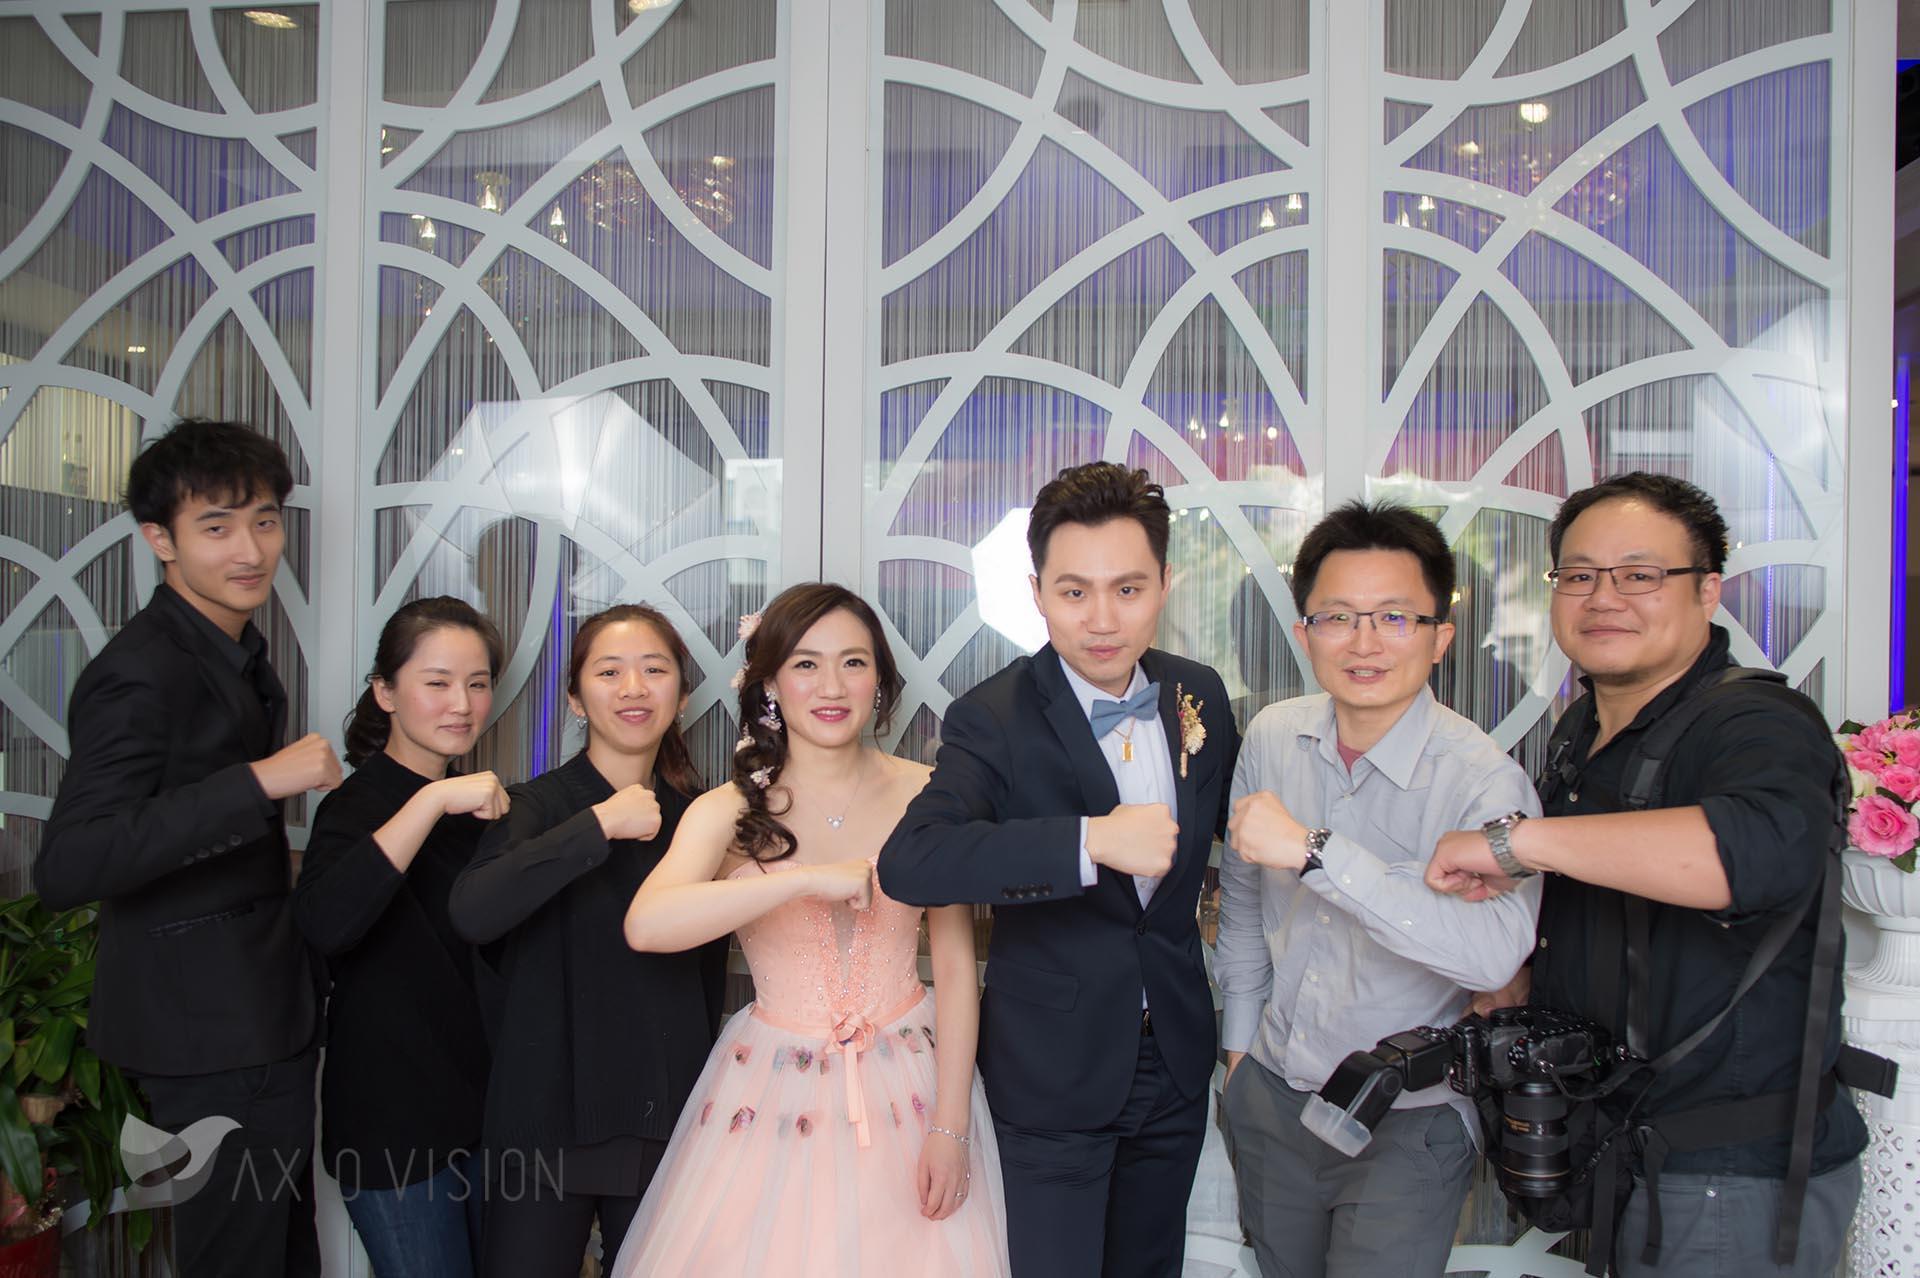 WeddingDay20170401A_289